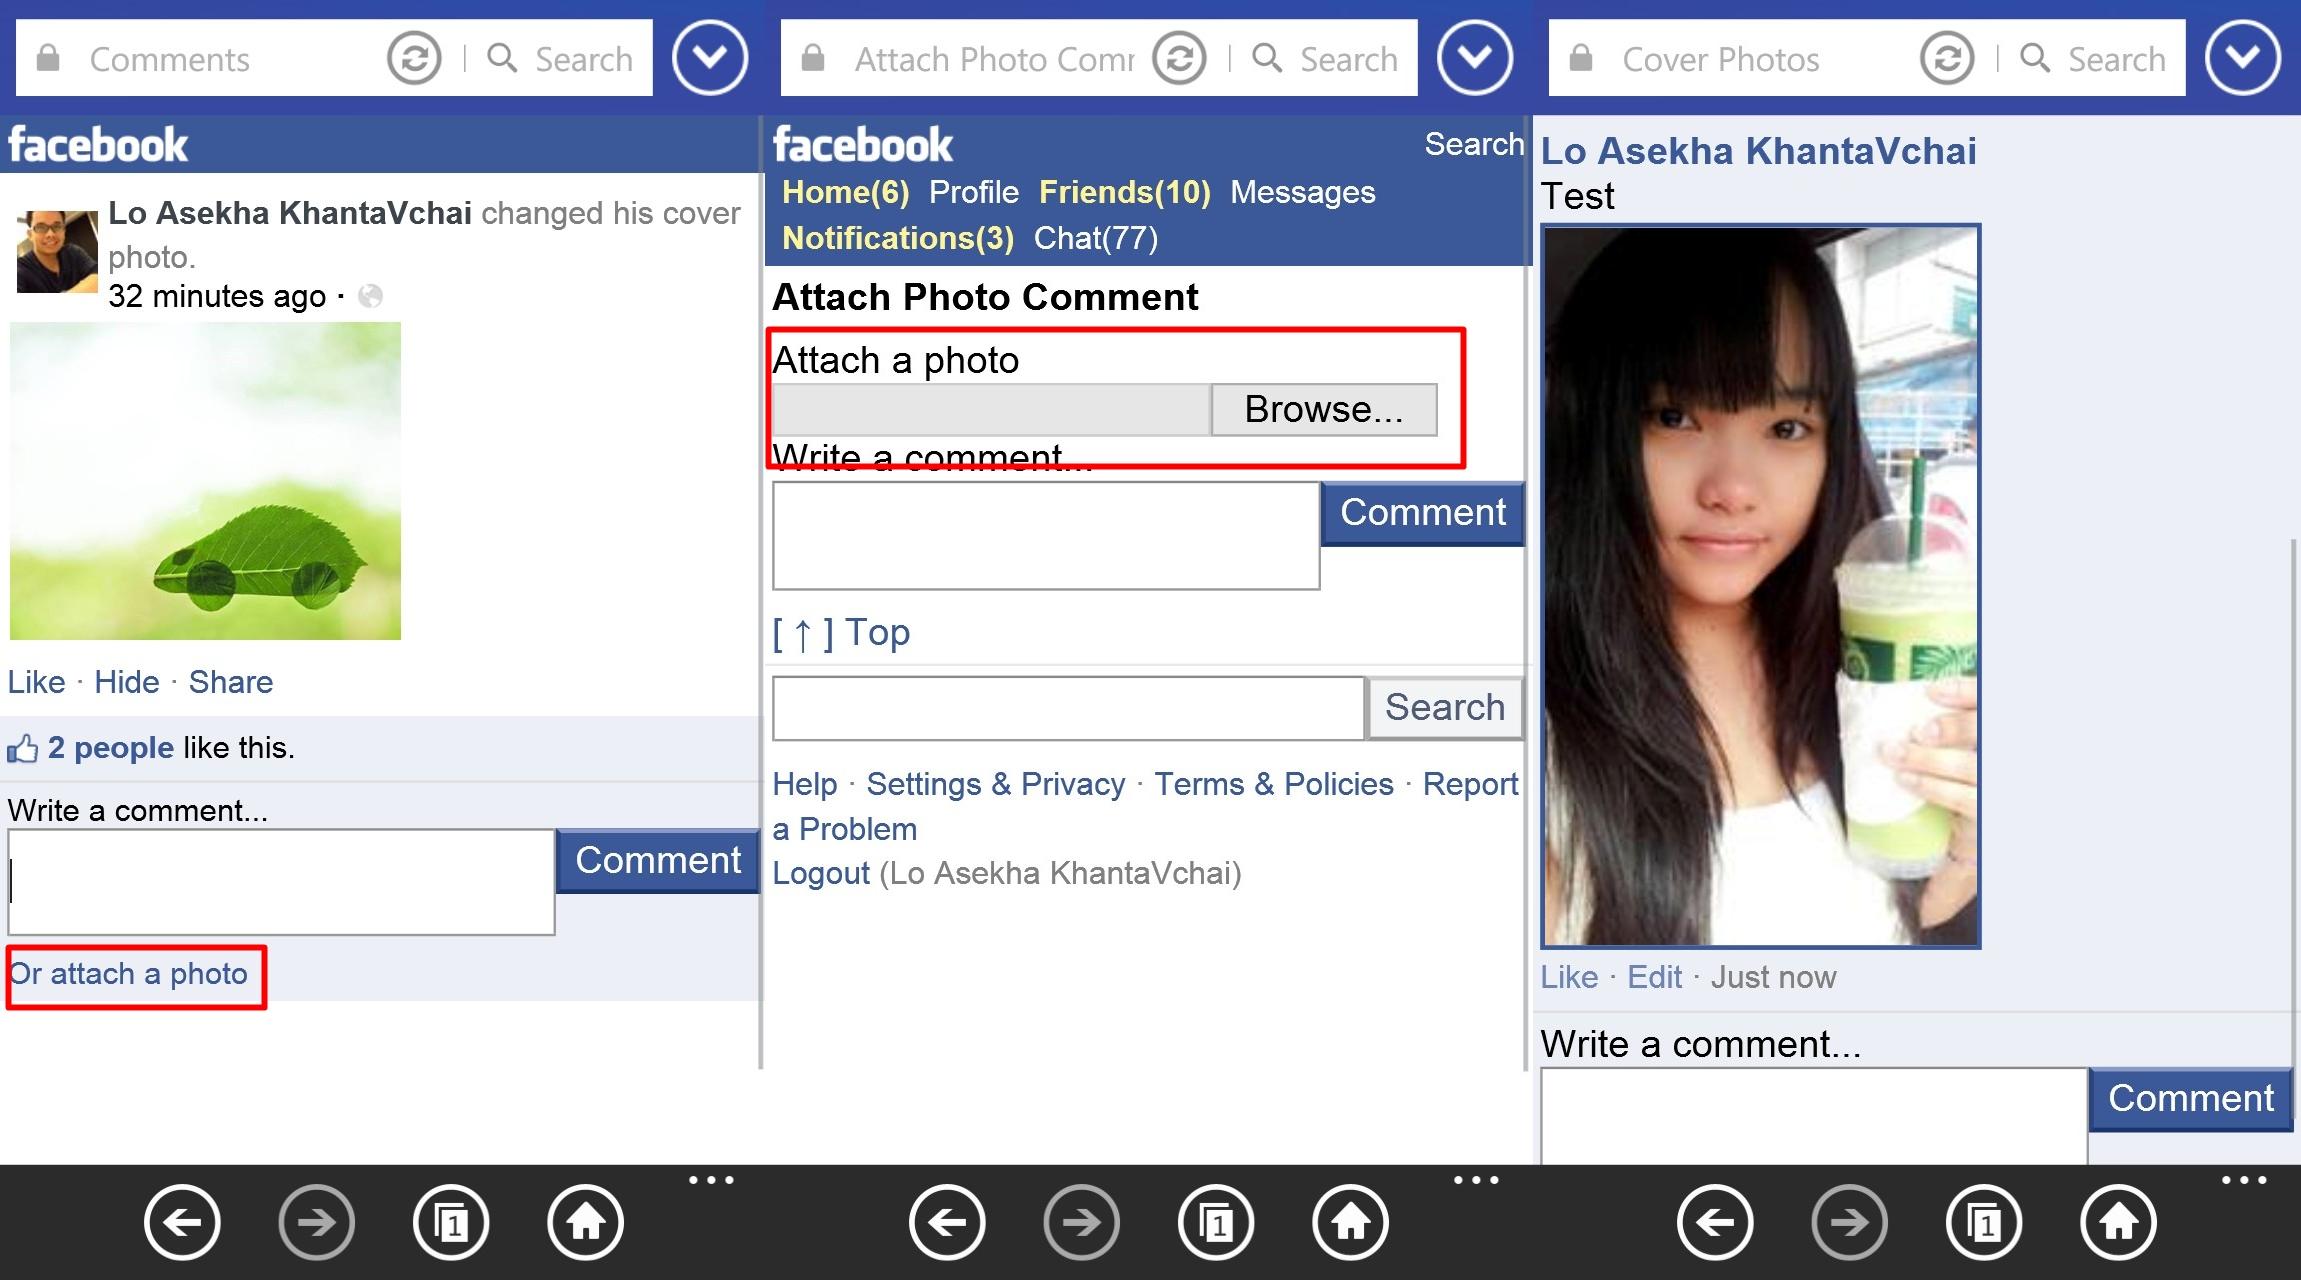 Tips & Tricks] วิธีโพสรูปในคอมเม้นท์ของ Facebook สำหรับ